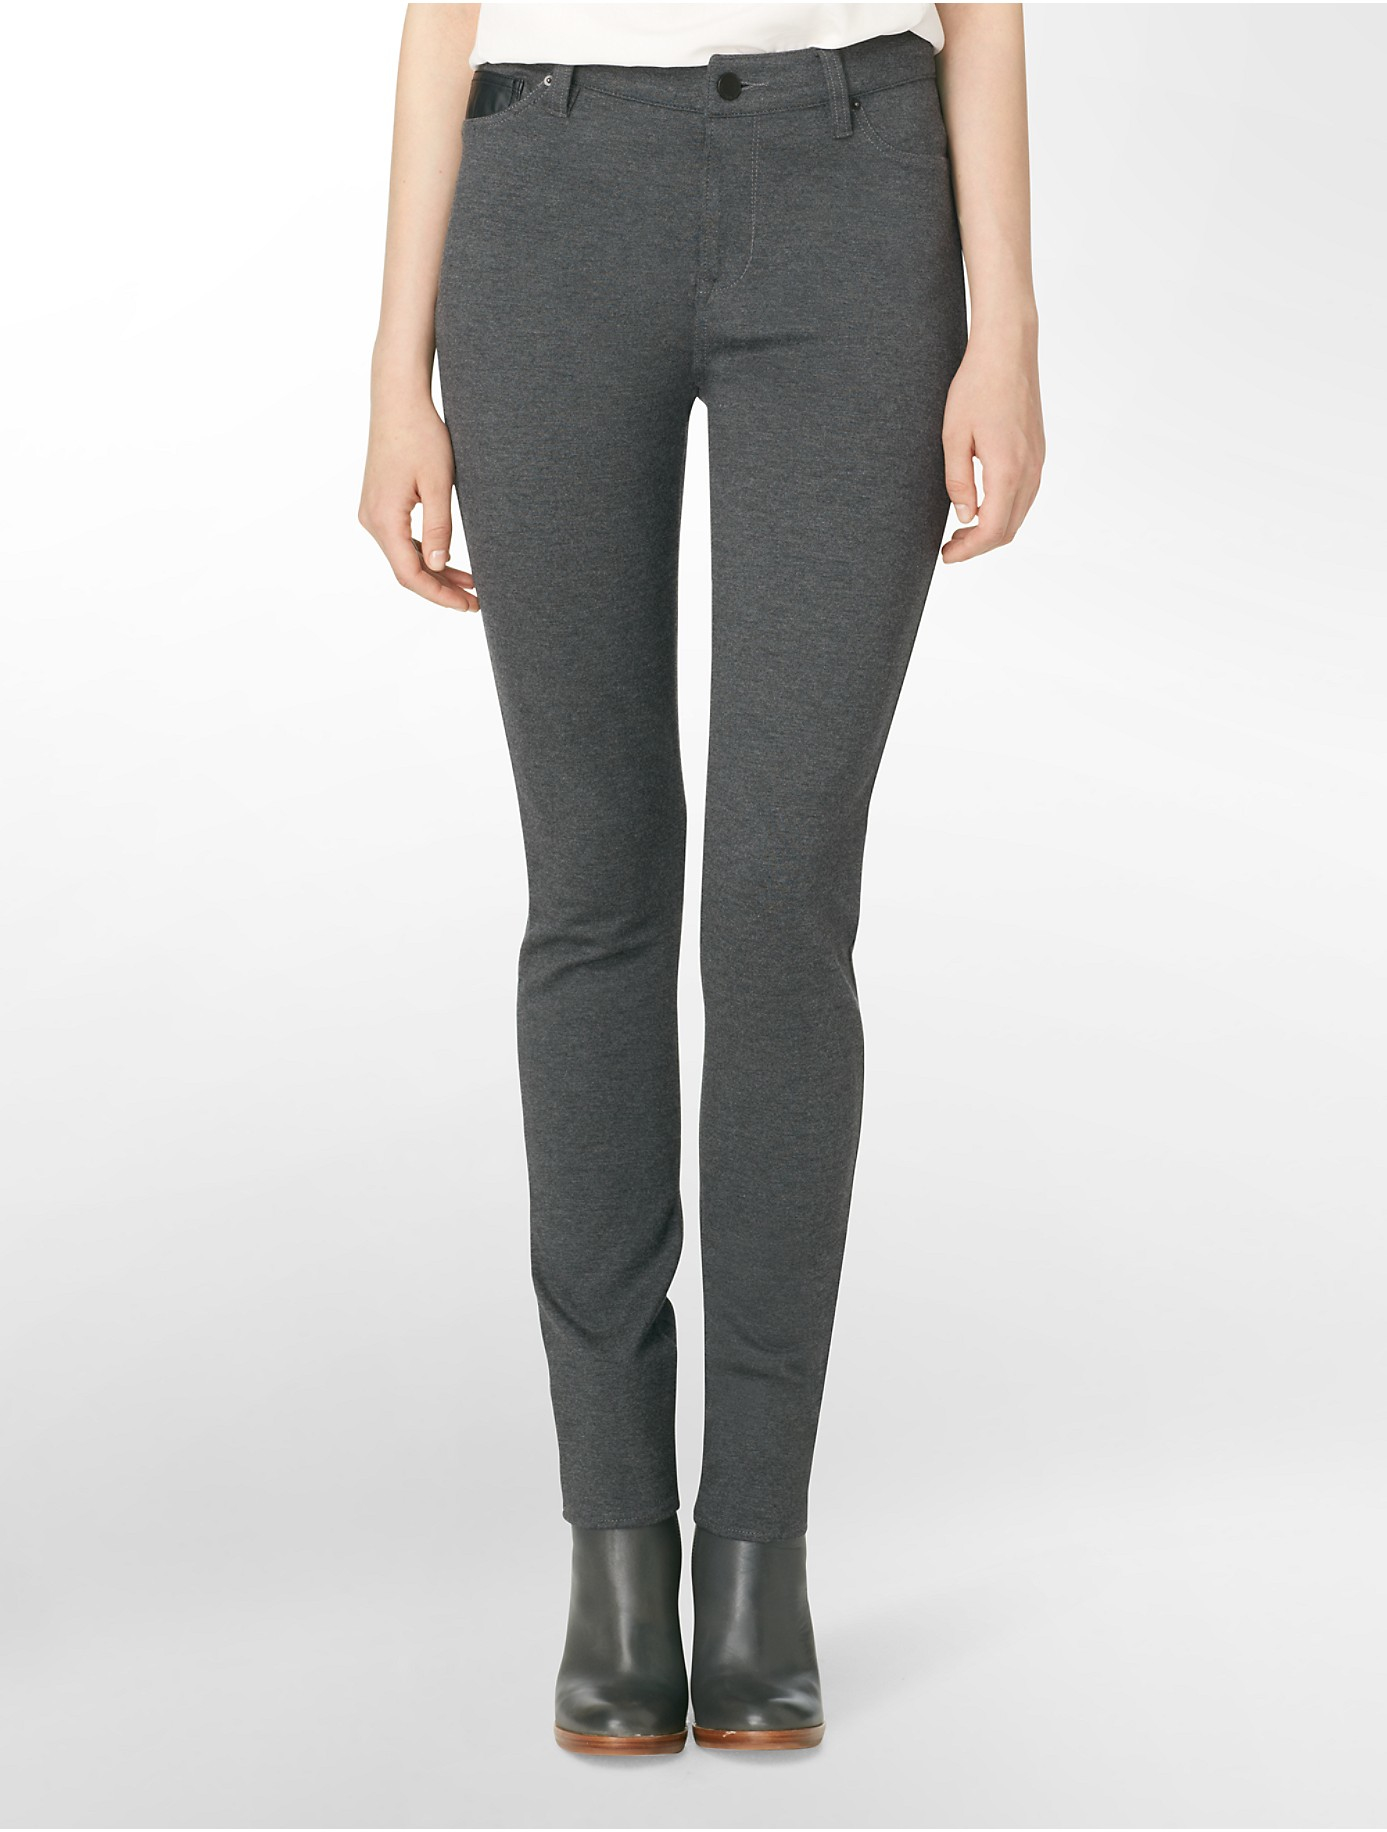 calvin klein jeans 5 pocket ponte leggings in gray charcoal. Black Bedroom Furniture Sets. Home Design Ideas